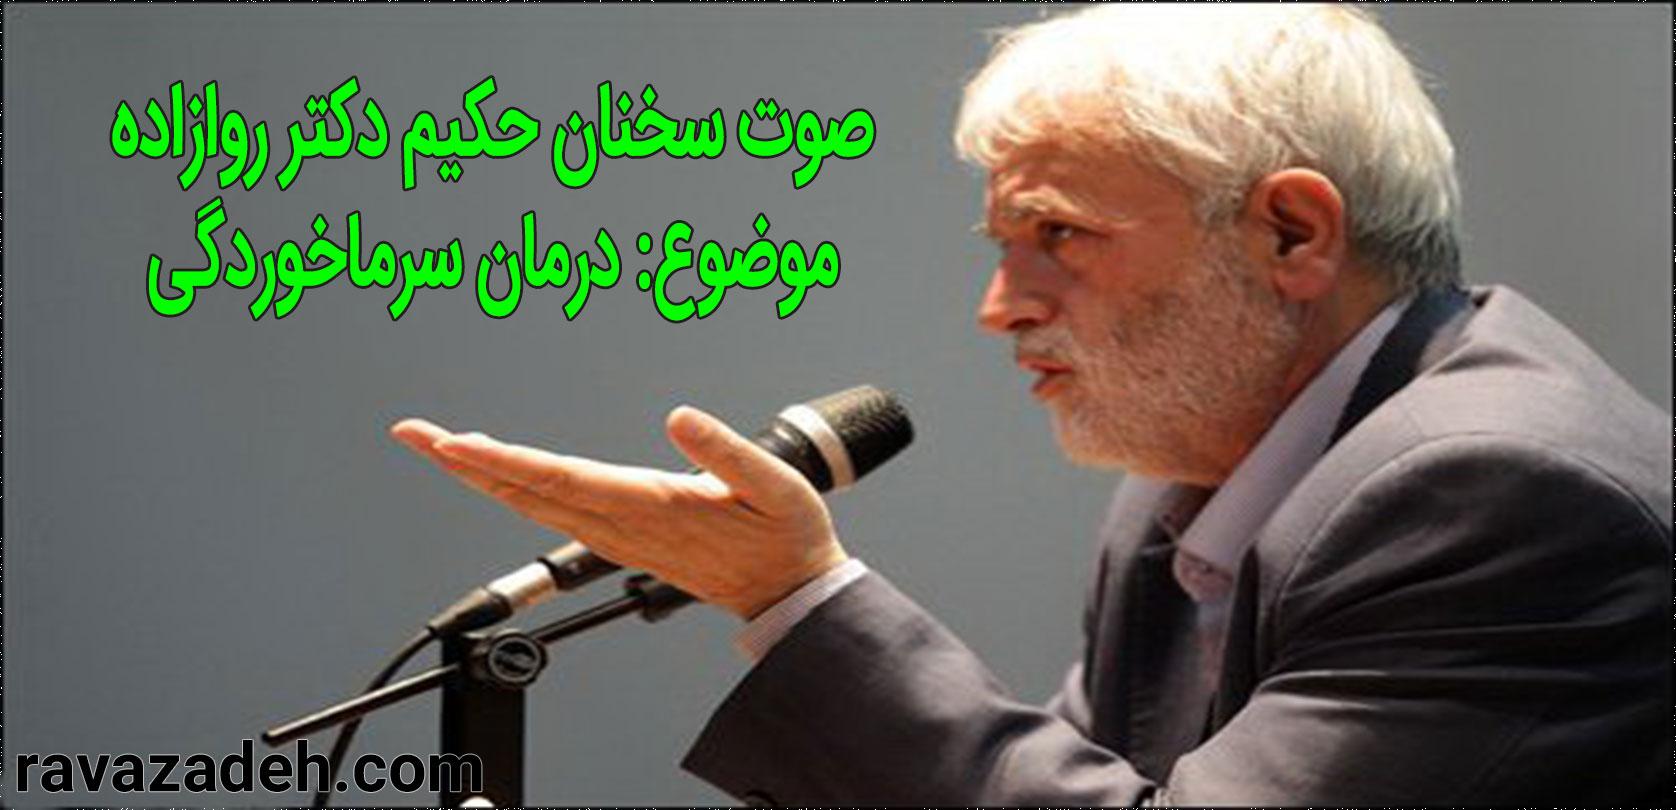 Photo of فایل سخنرانی حکیم دکتر روازاده: درمان سرماخوردگی